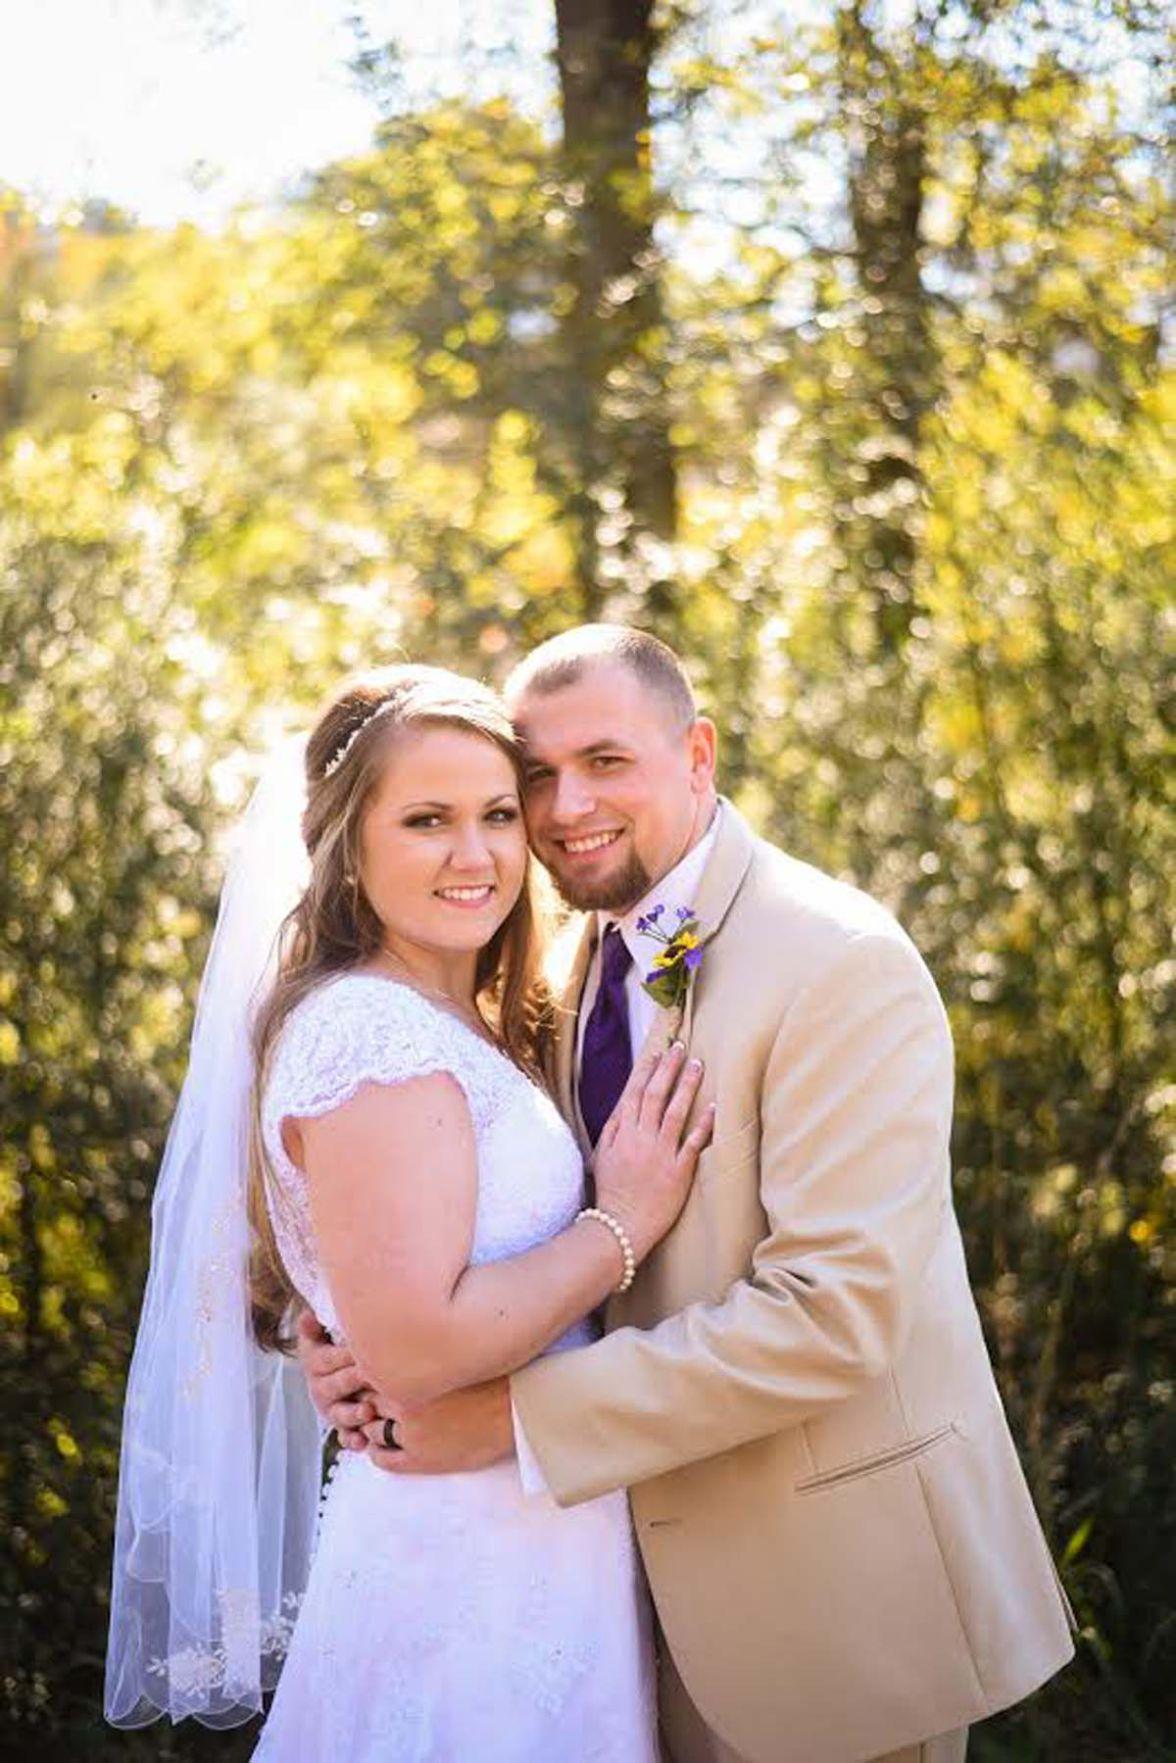 Mr. and Mrs. Ricky Allen Mills